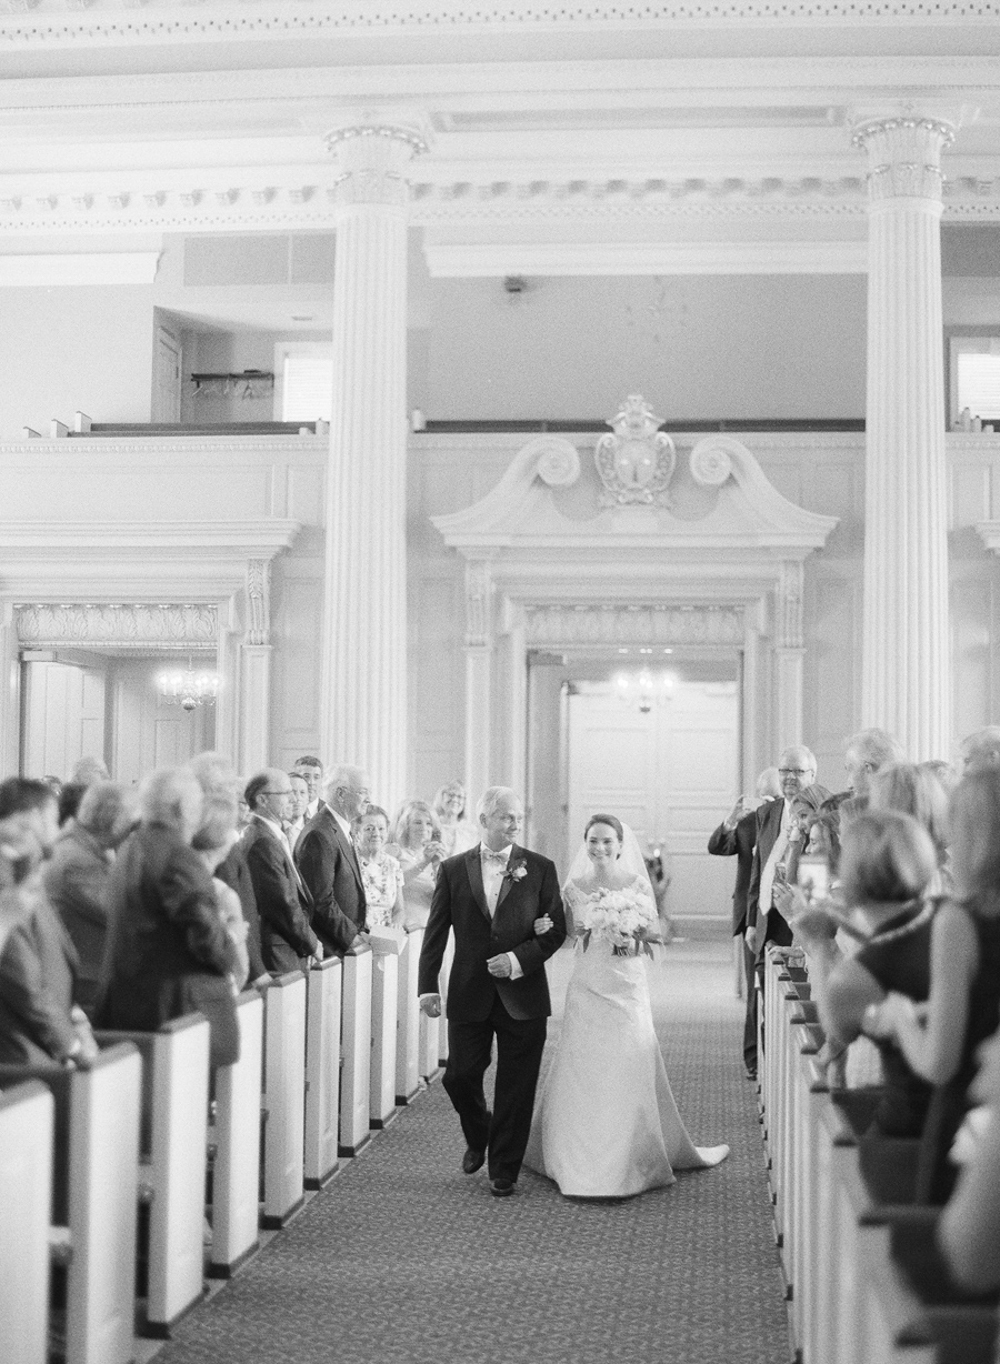 Glen_View_Club_Chicago_wedding_012.jpg